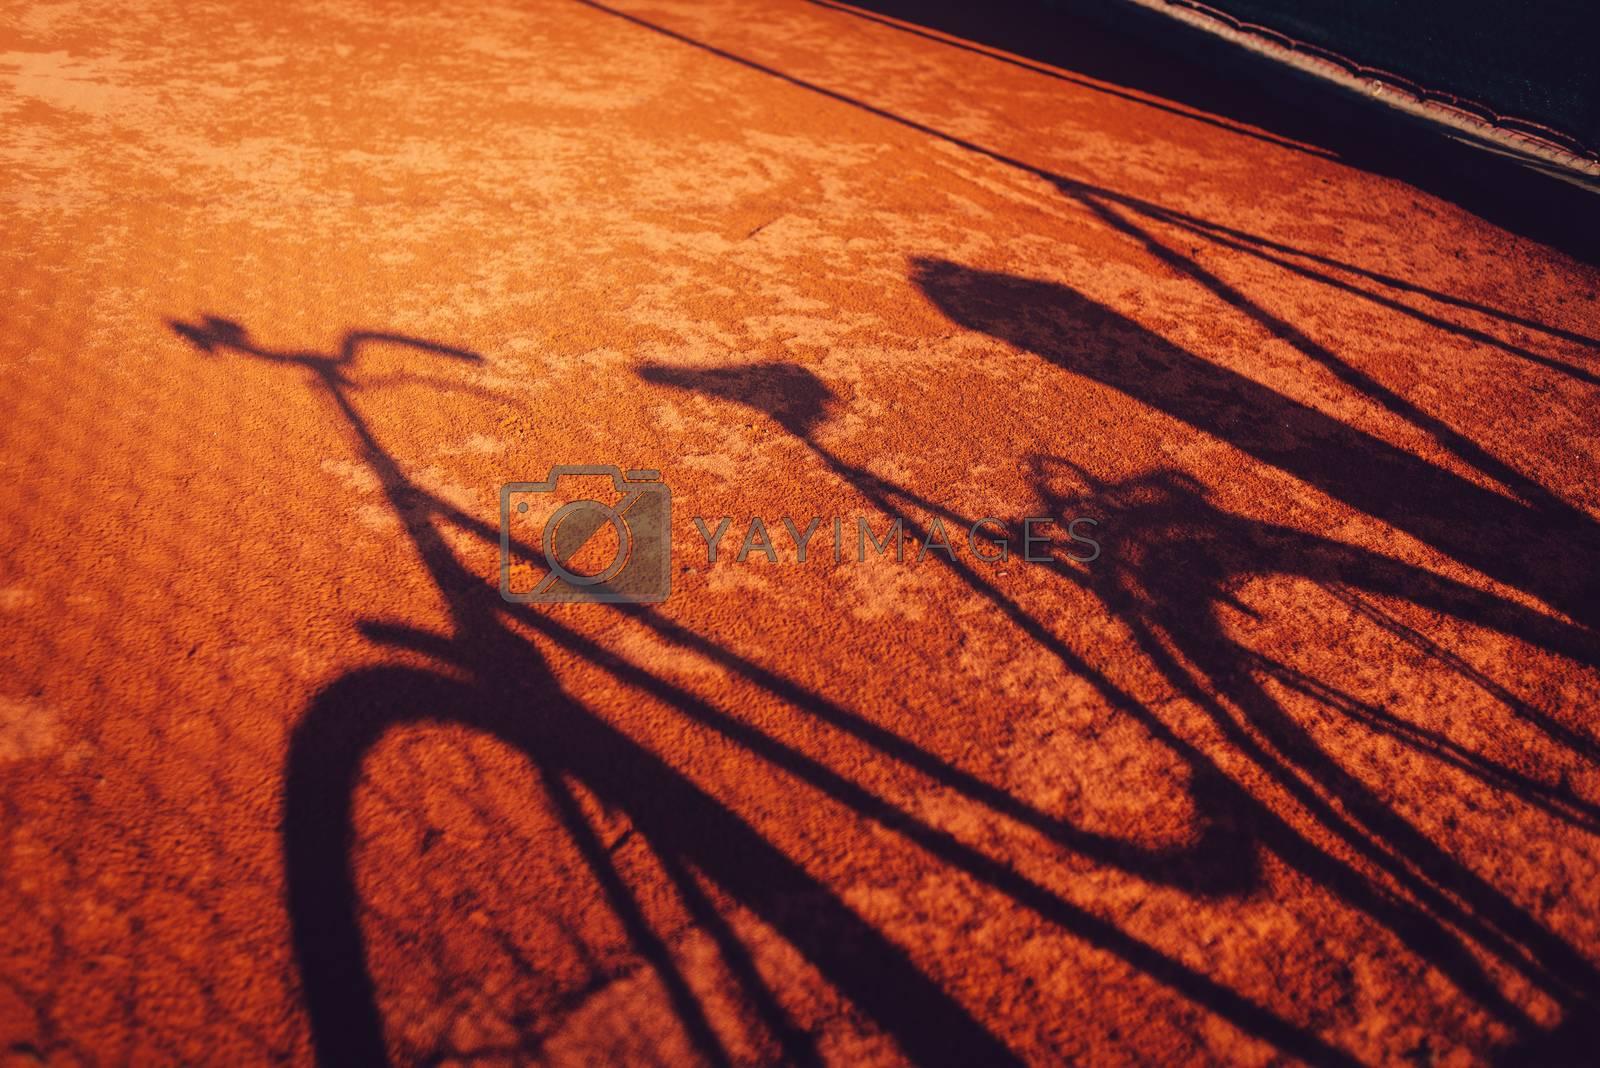 Vintage bicycle shadow by stevanovicigor